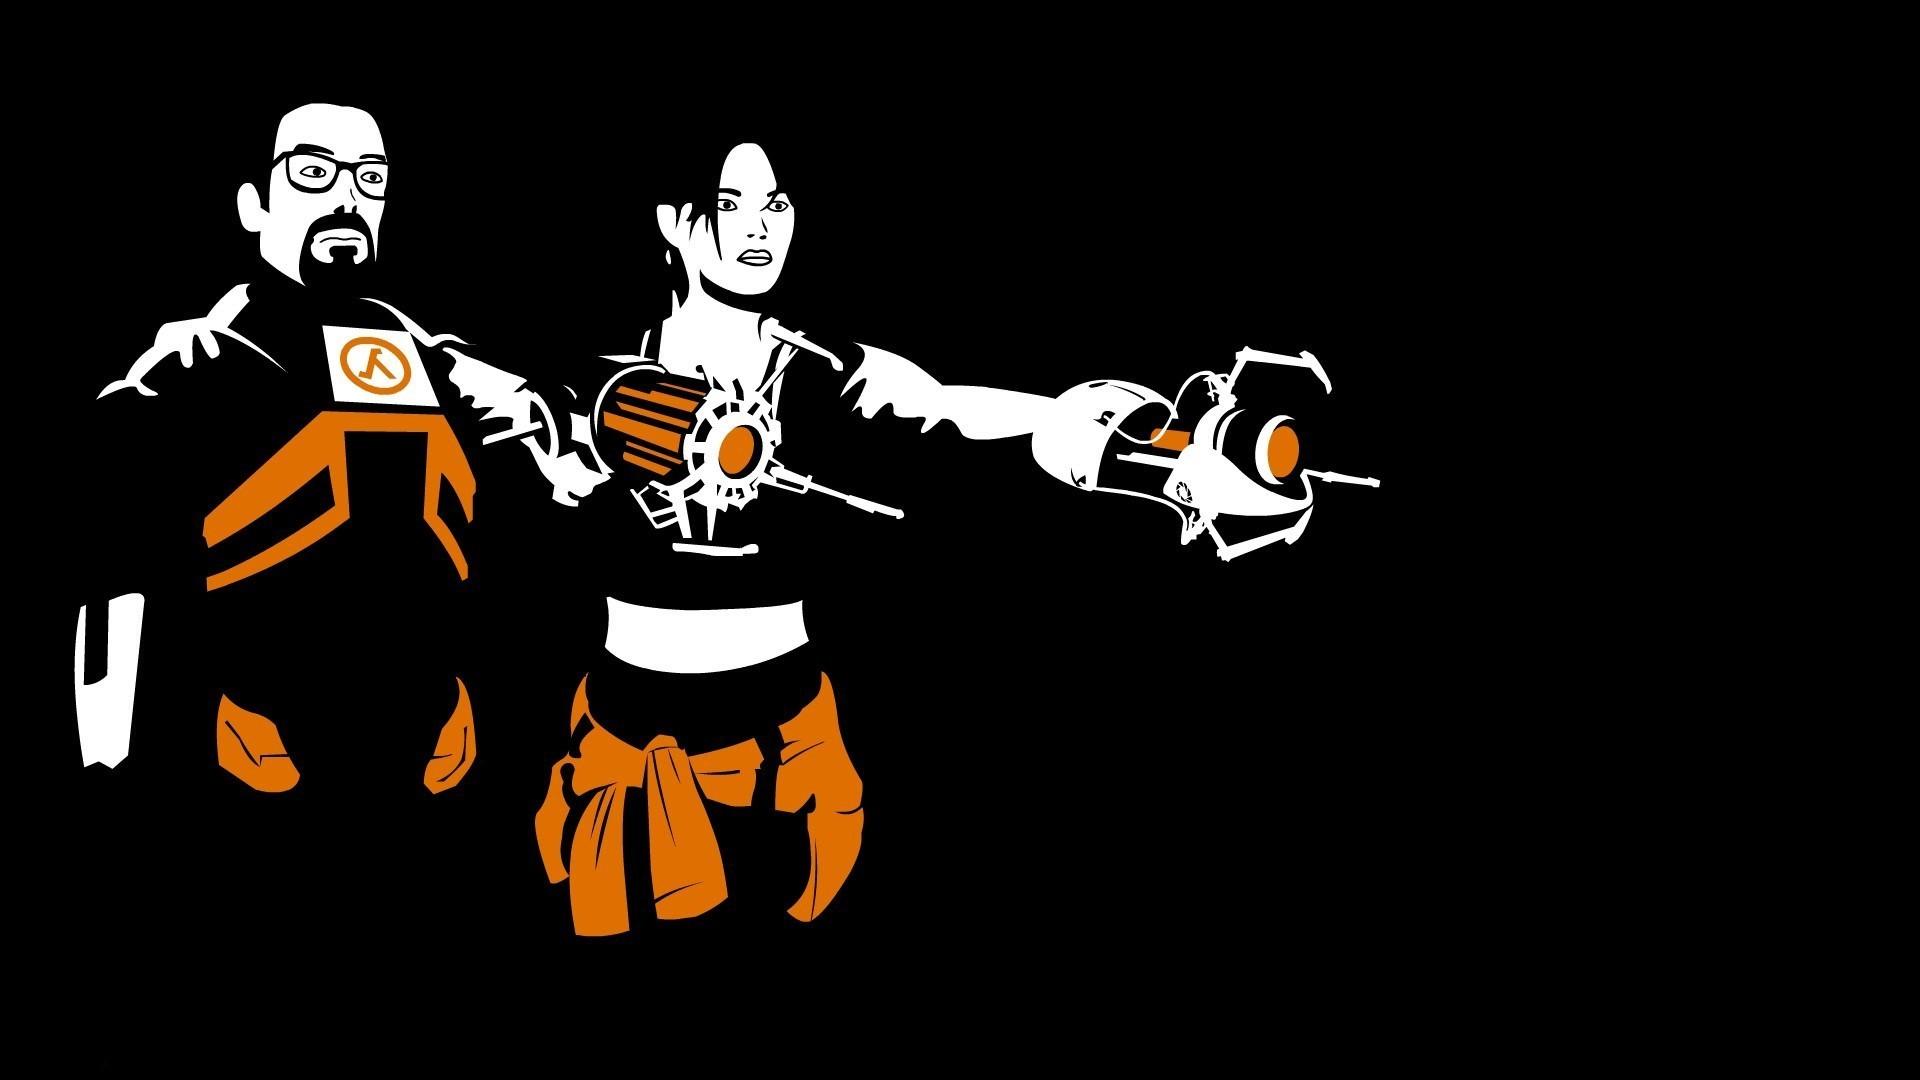 Half Life 2, Portal 2, Black Background, Vectors, Orange, Video Games